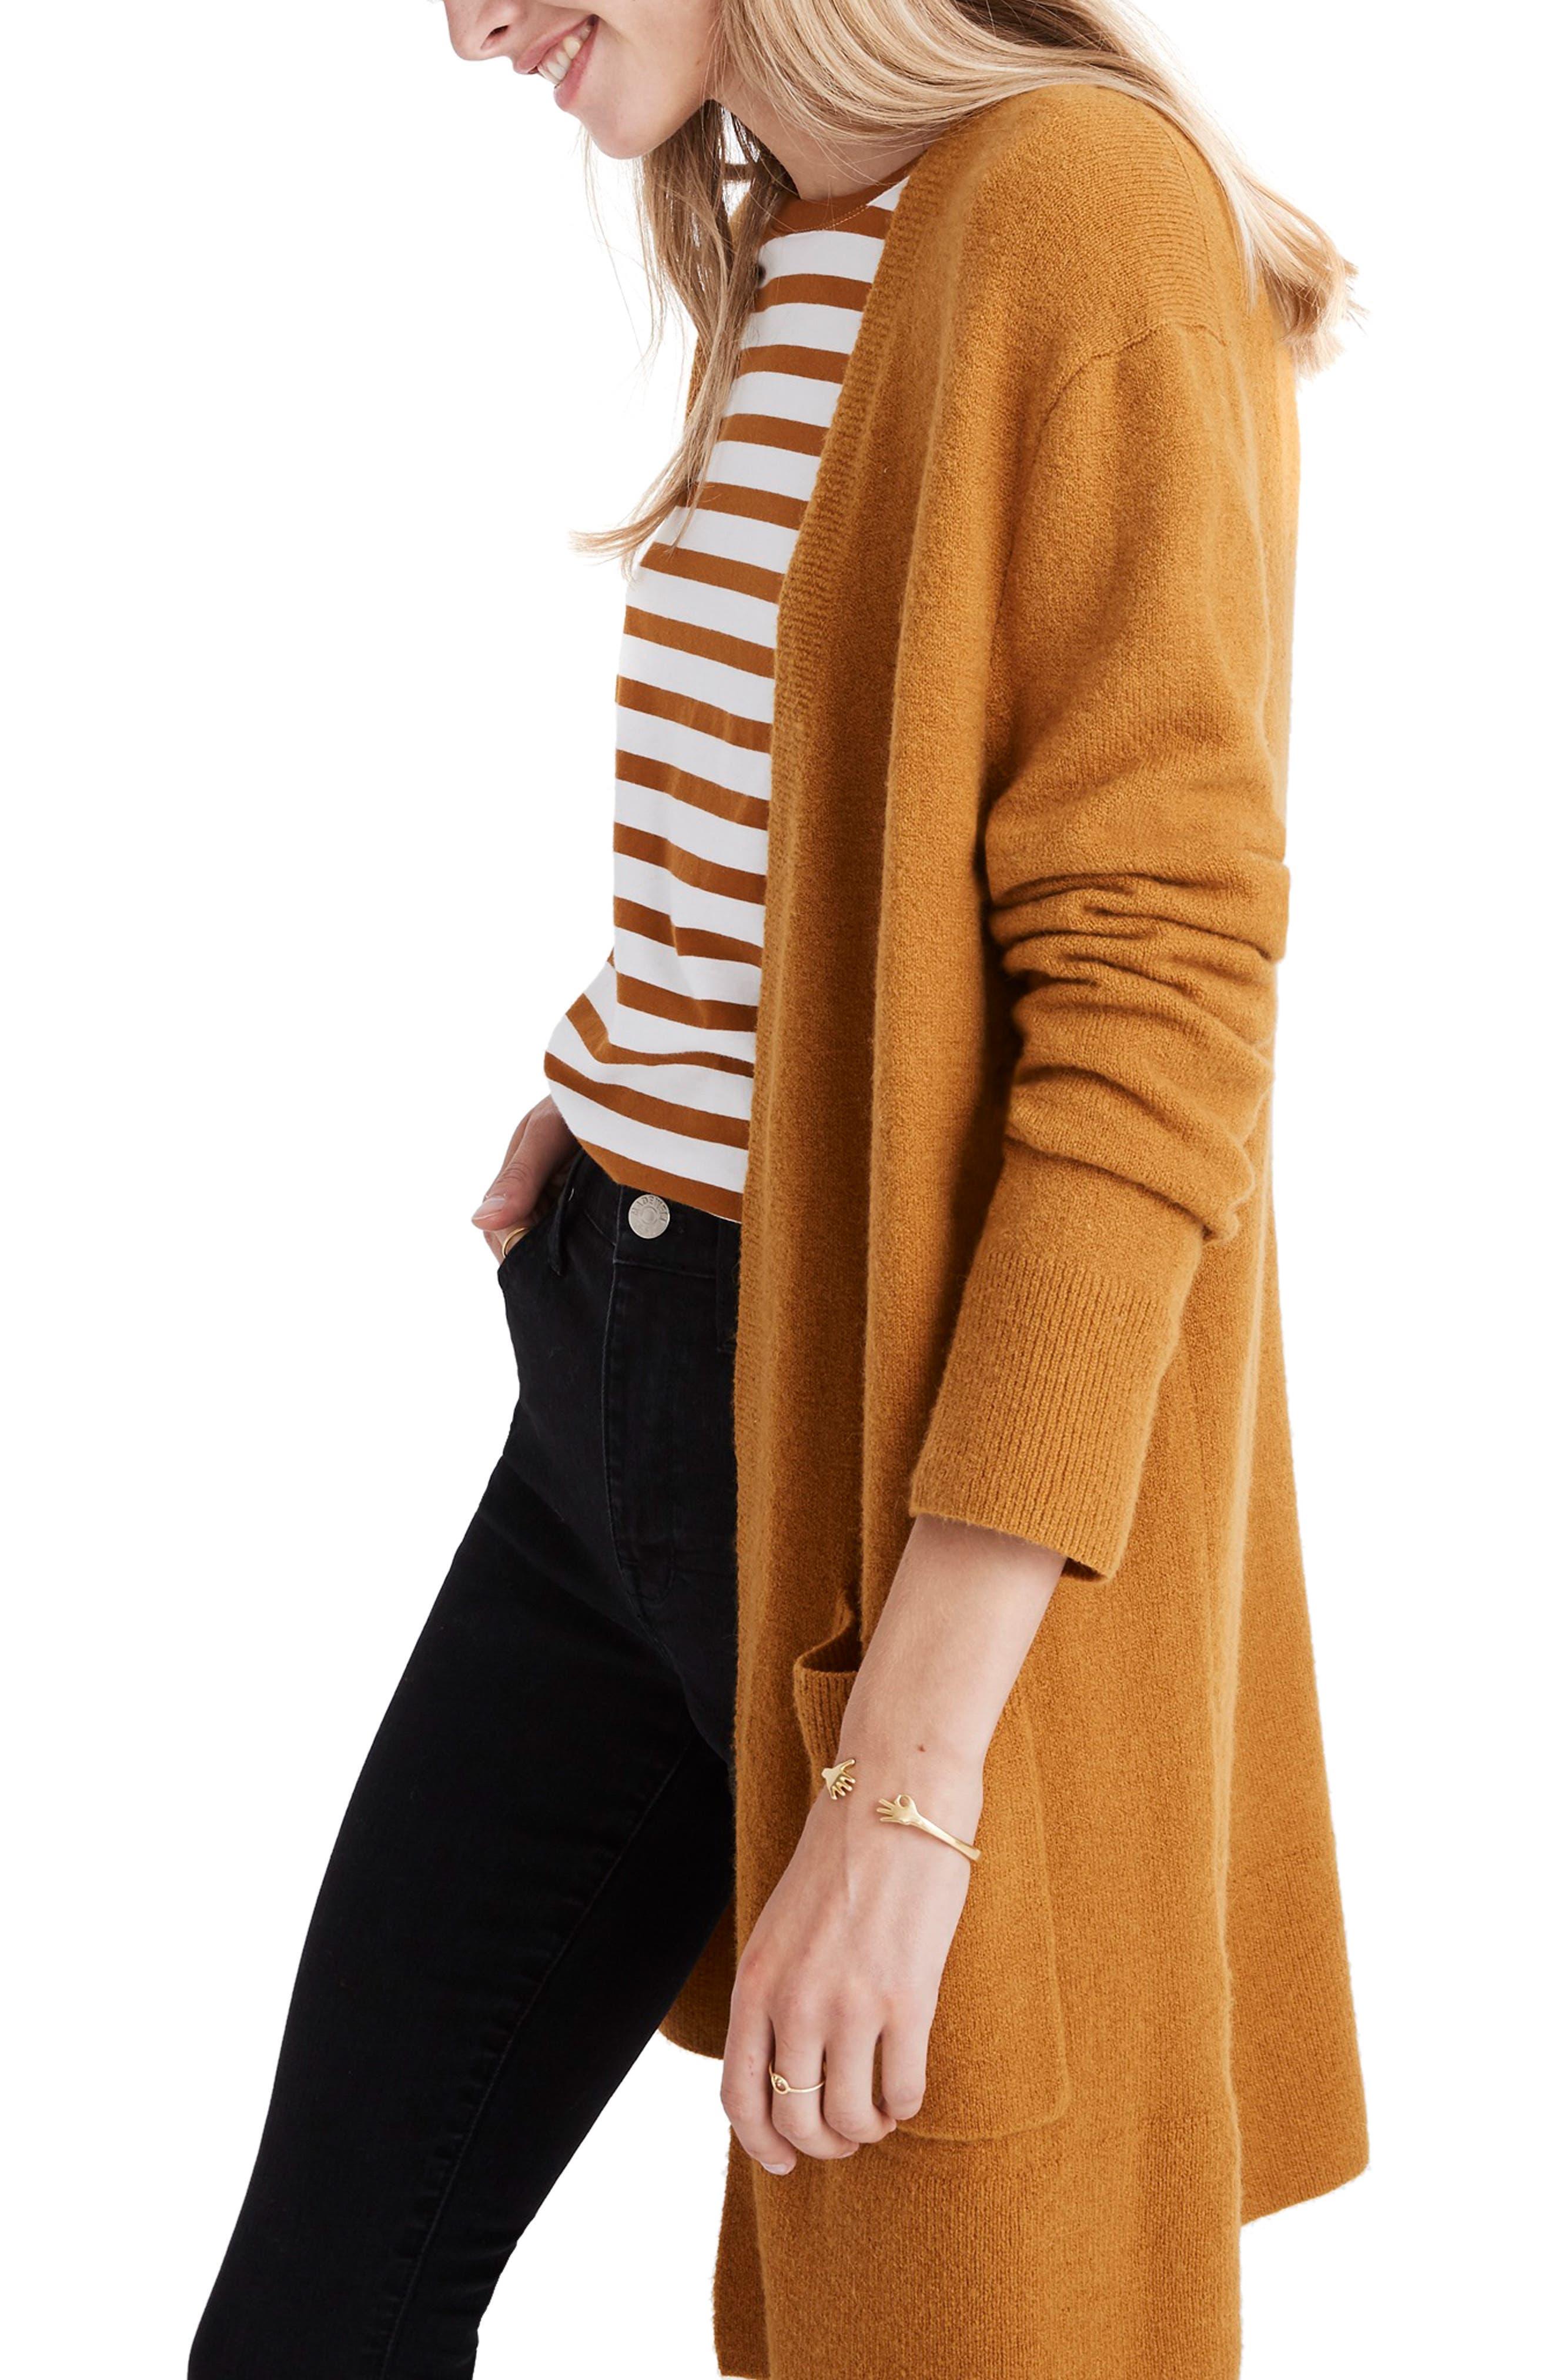 MADEWELL, Kent Cardigan Sweater, Alternate thumbnail 3, color, 801